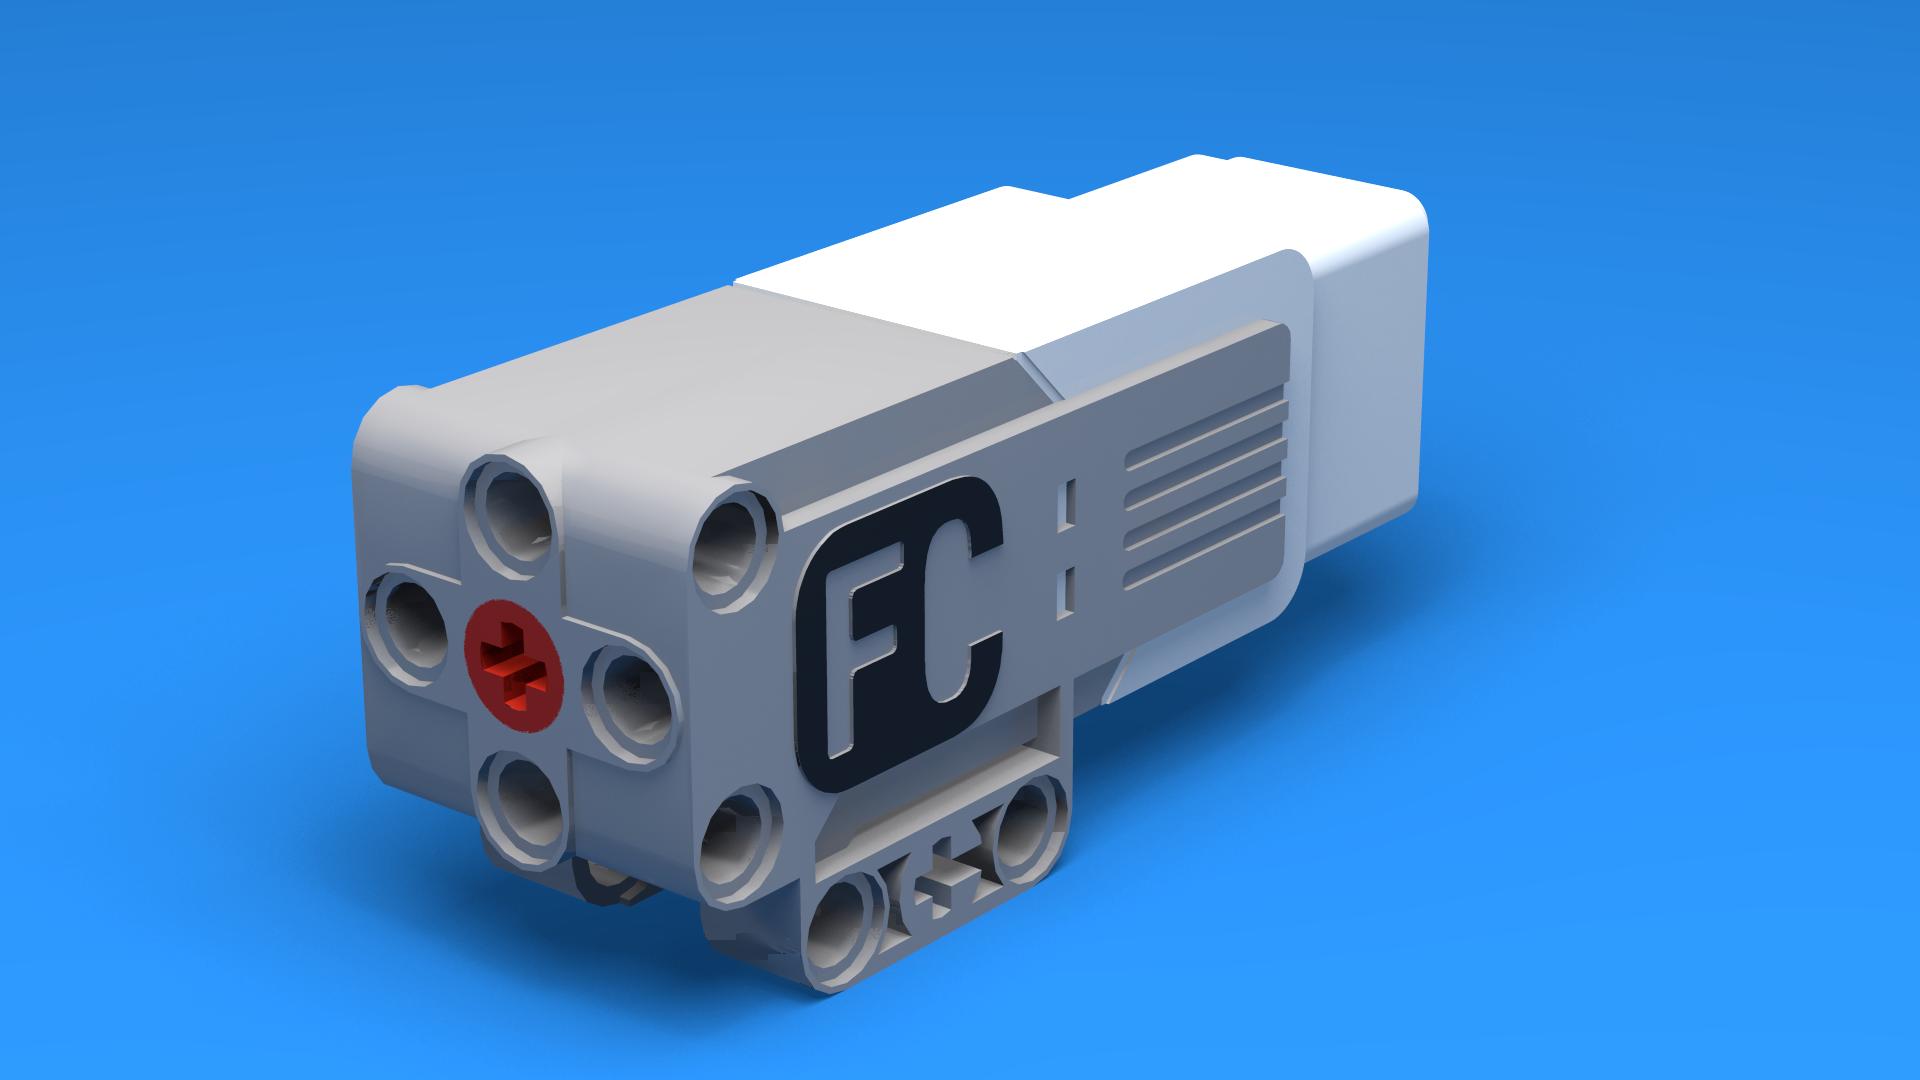 LEGO-Mindstorms-Ev3-Medium-Motor-Fllcasts